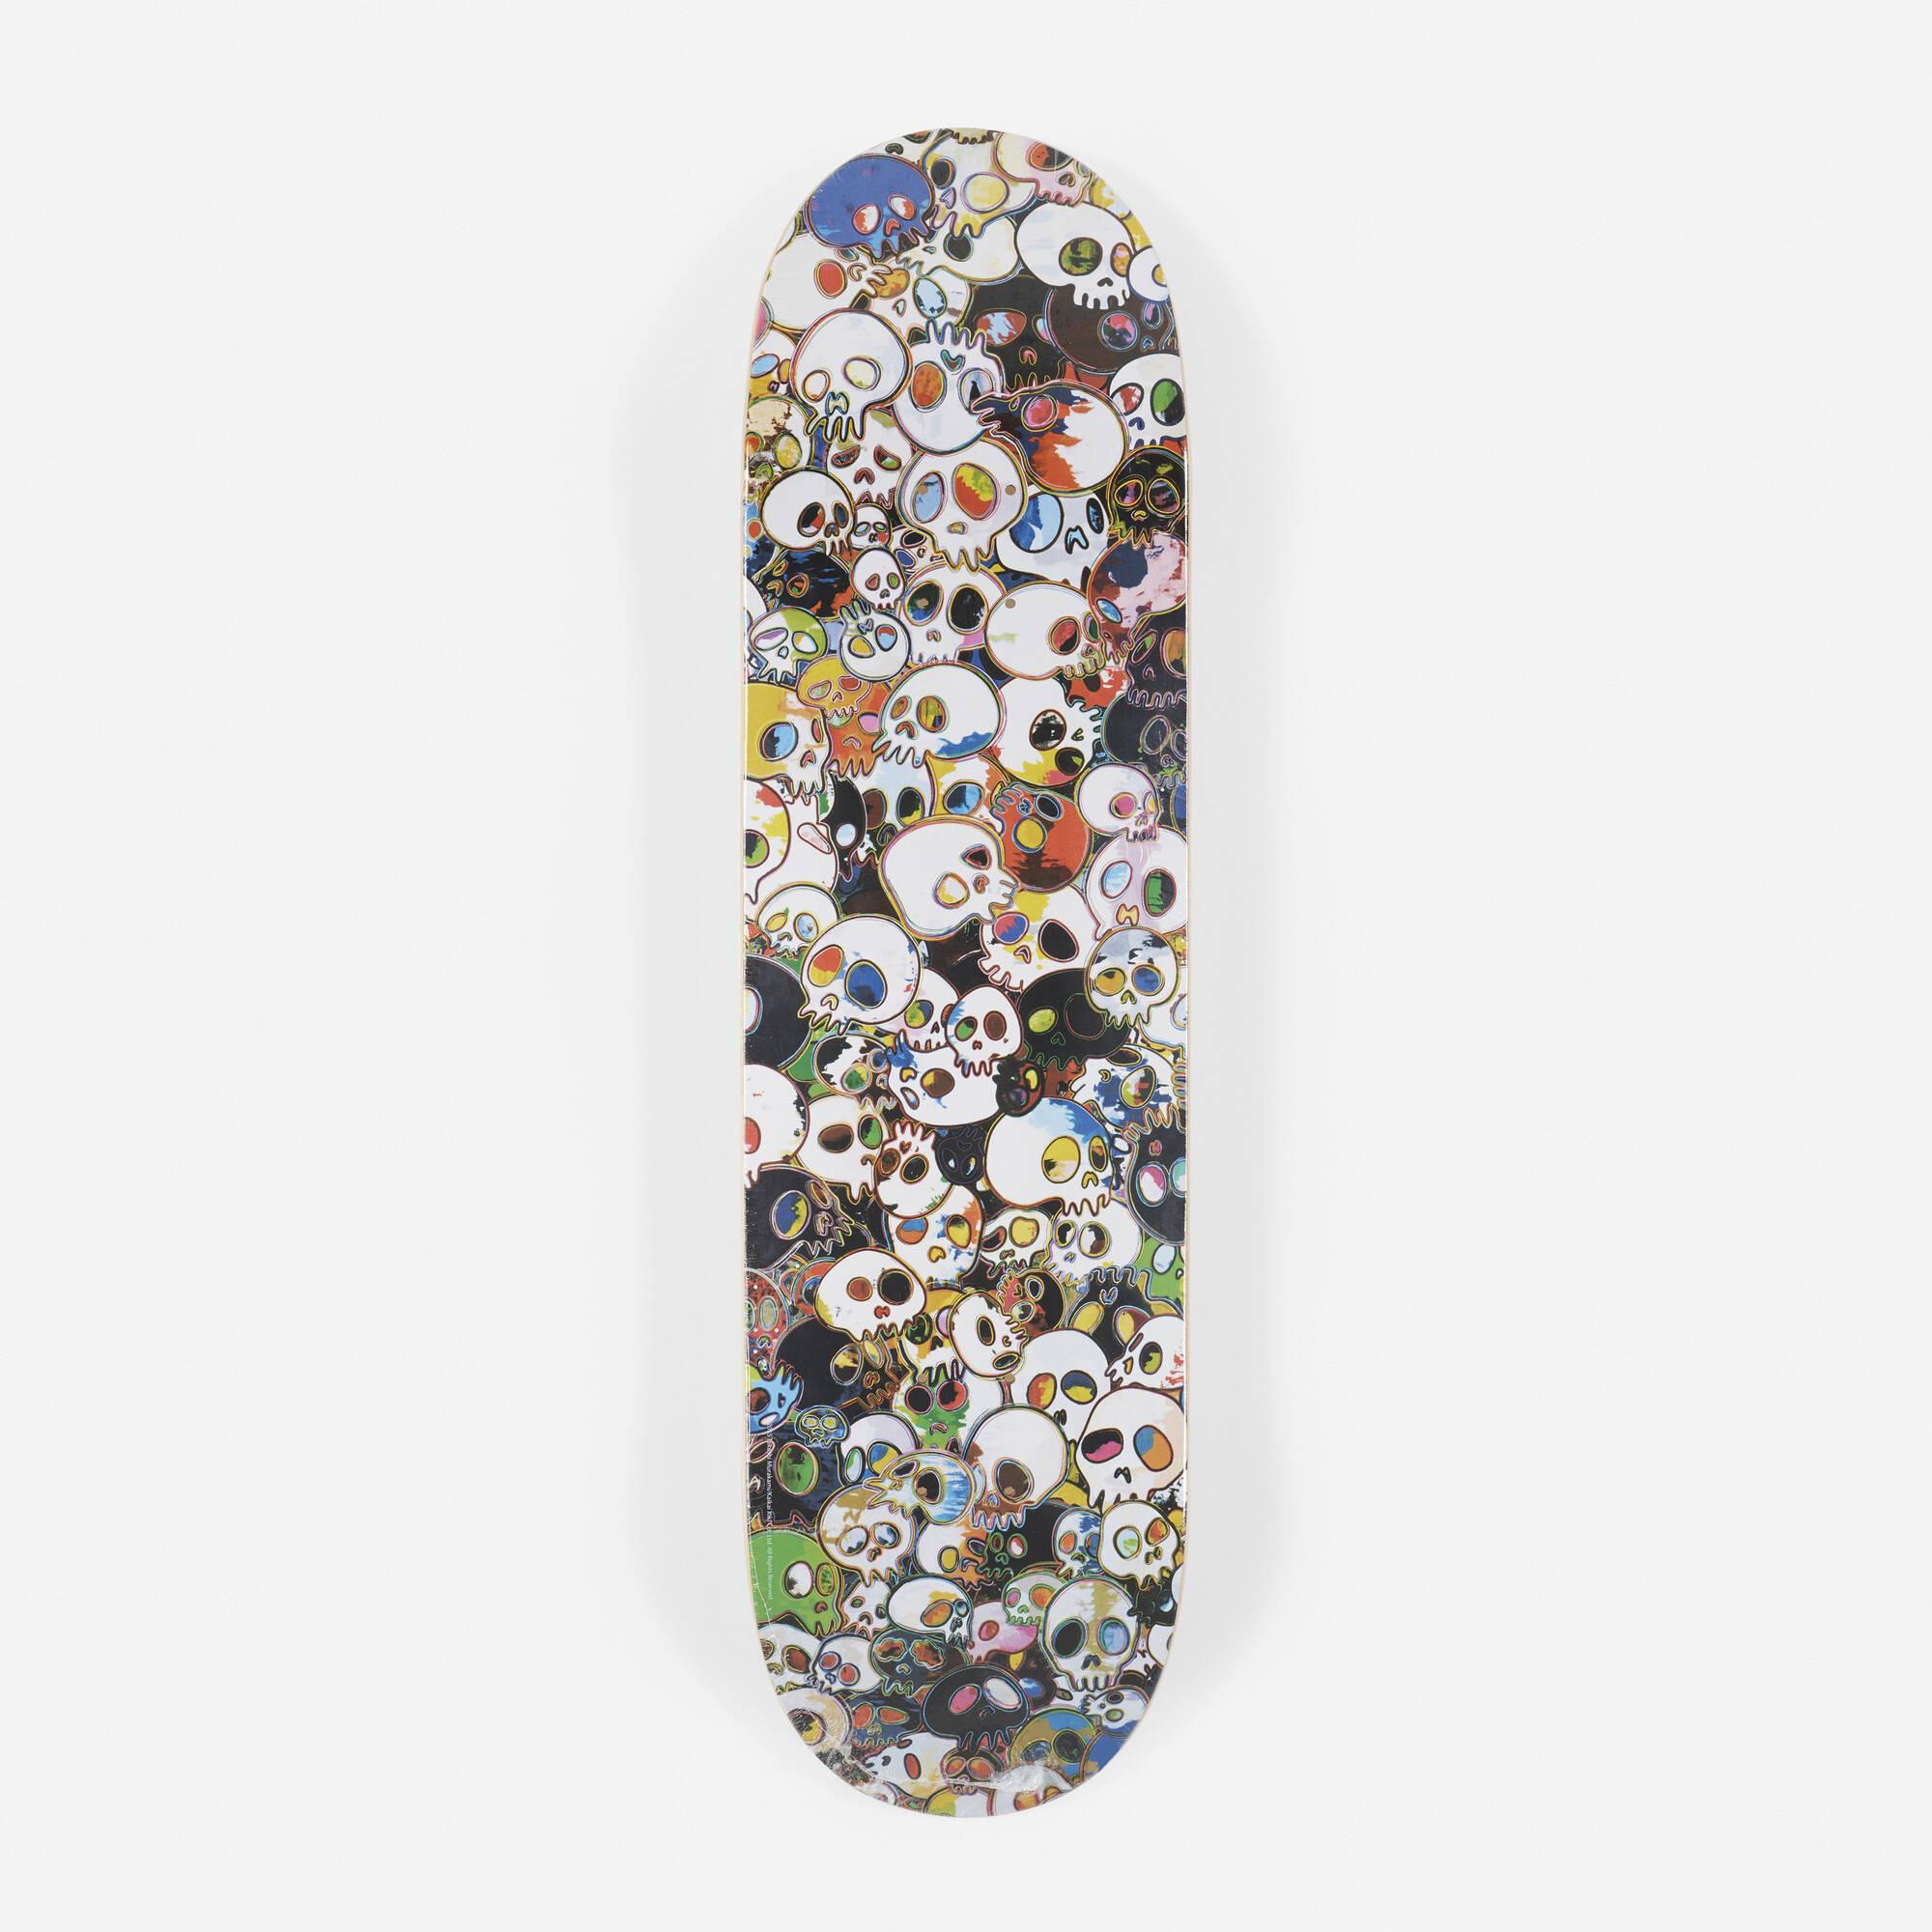 623: Takashi Murakami / Vault by Vans x Takashi Murakami skateboard deck (1 of 1)